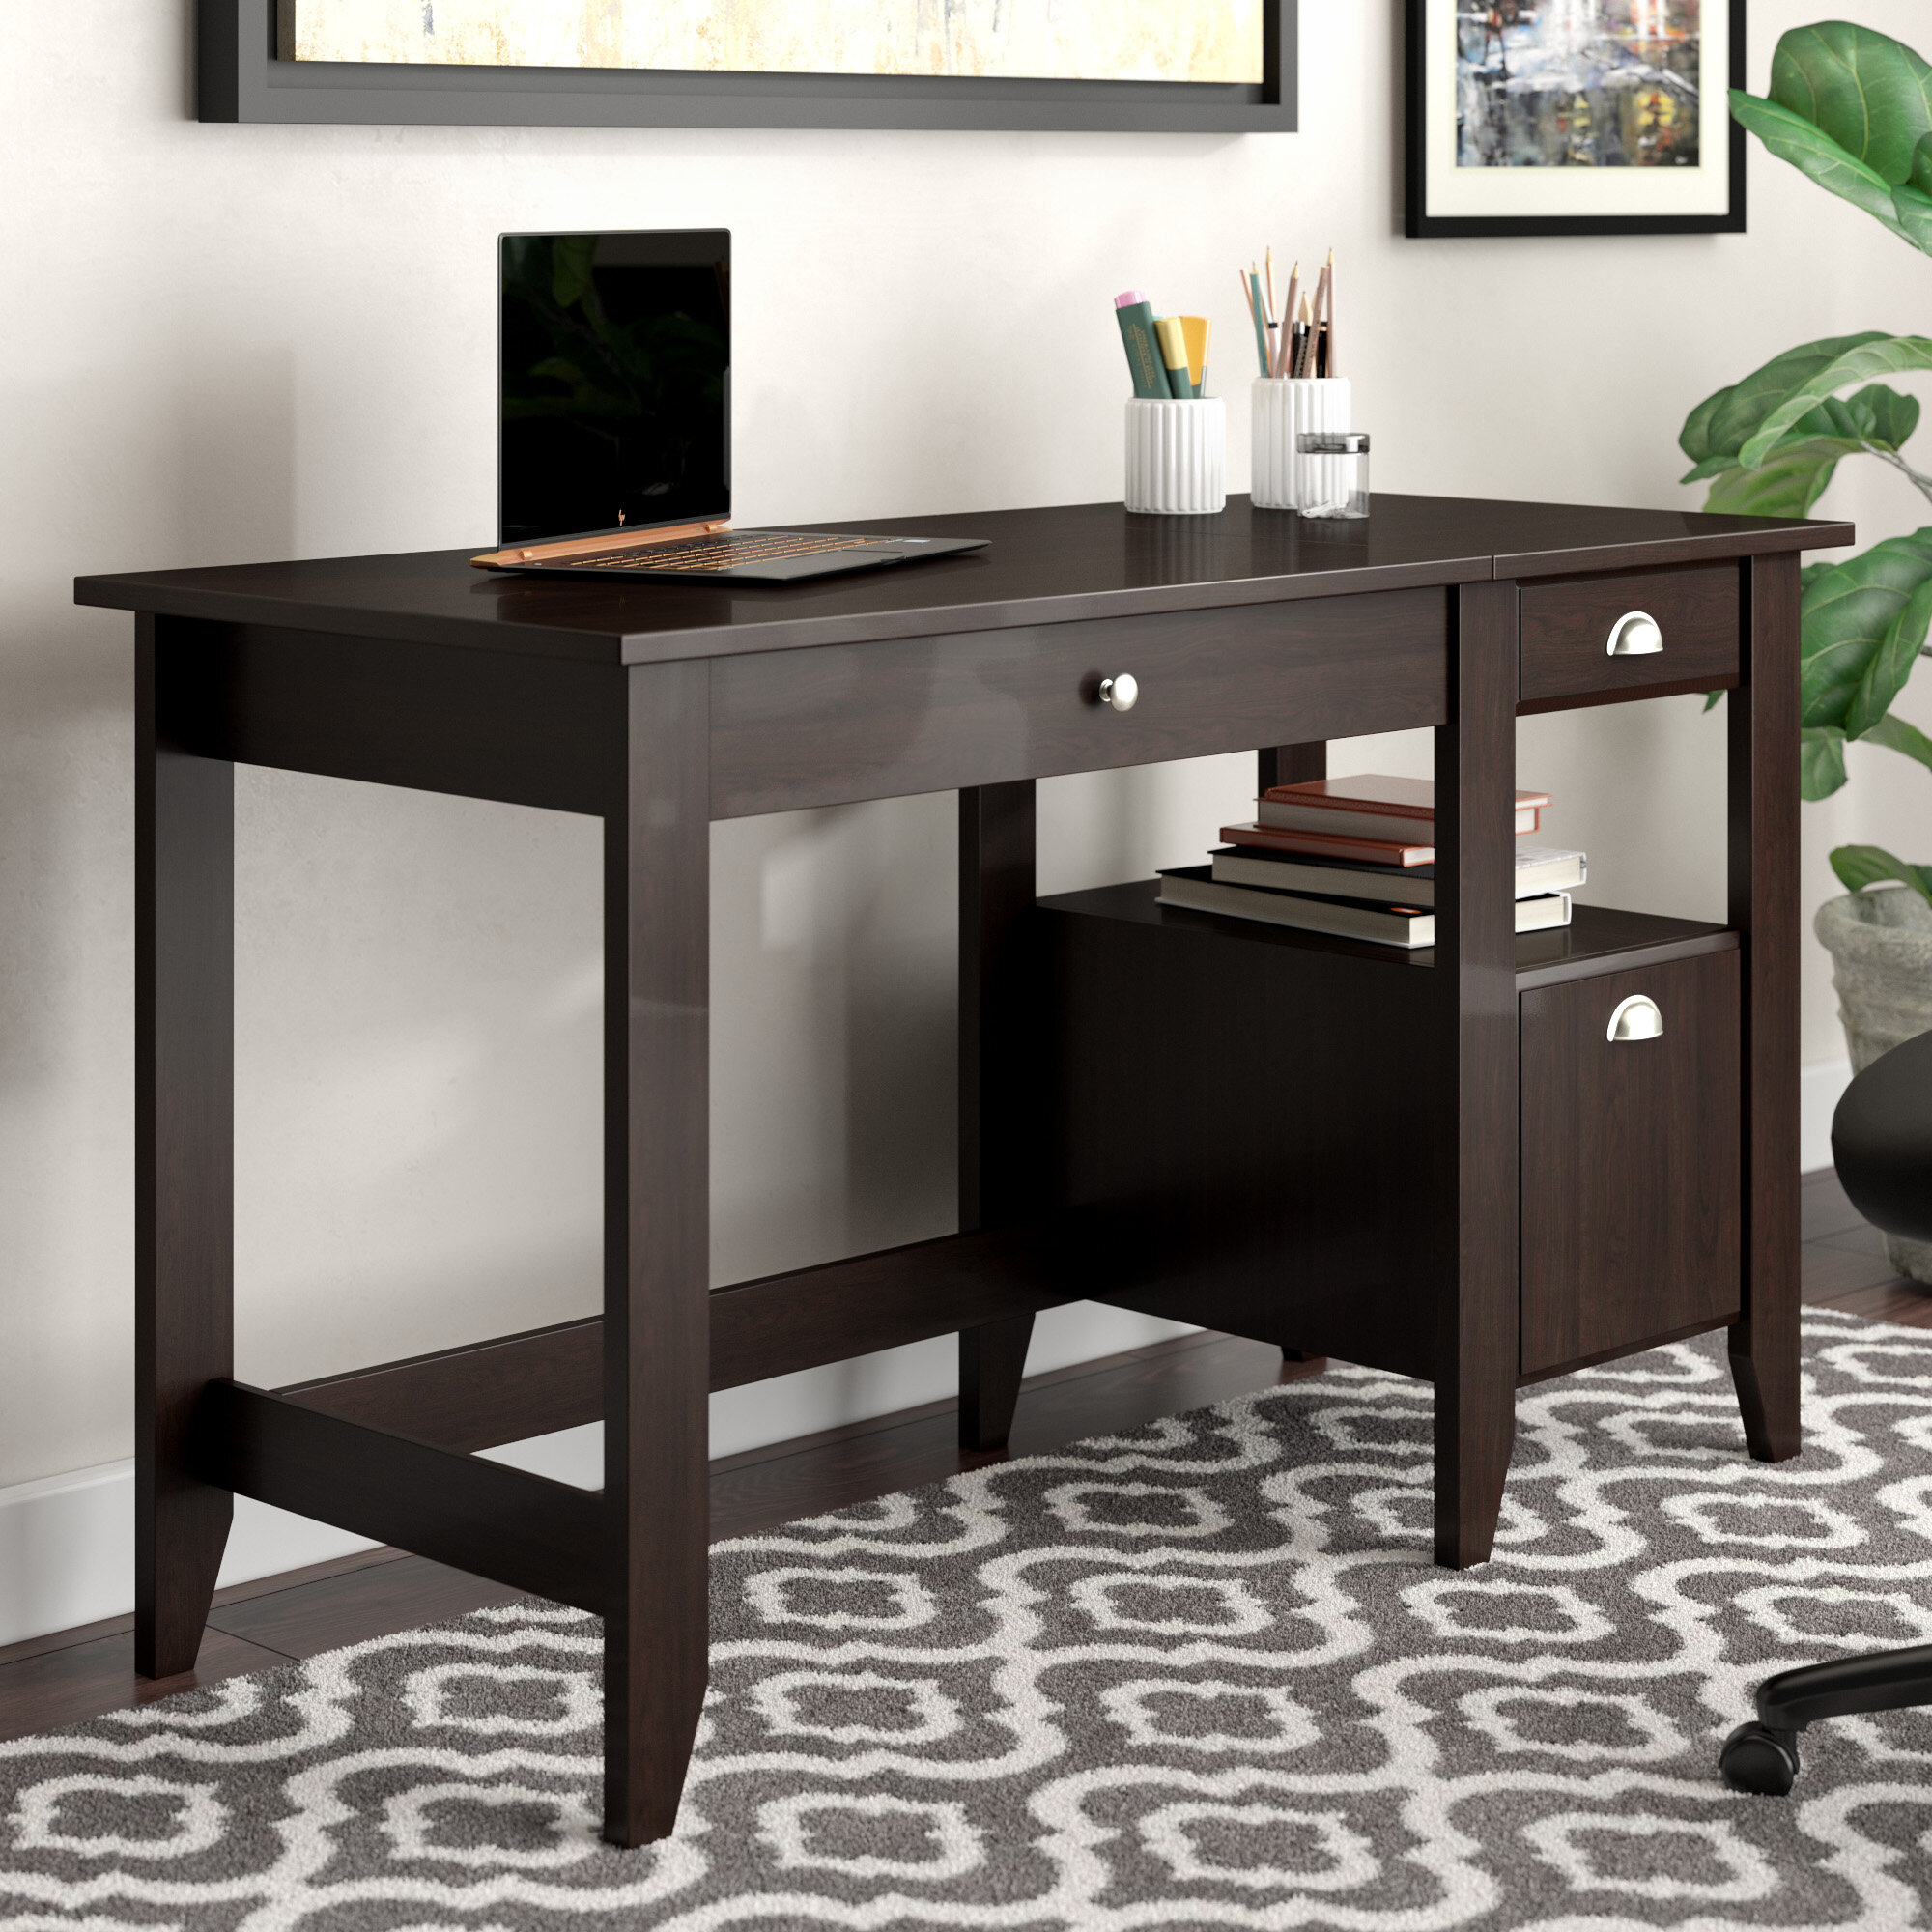 Revere Height Adjustable Standing Desk Converter Reviews Birch Lane